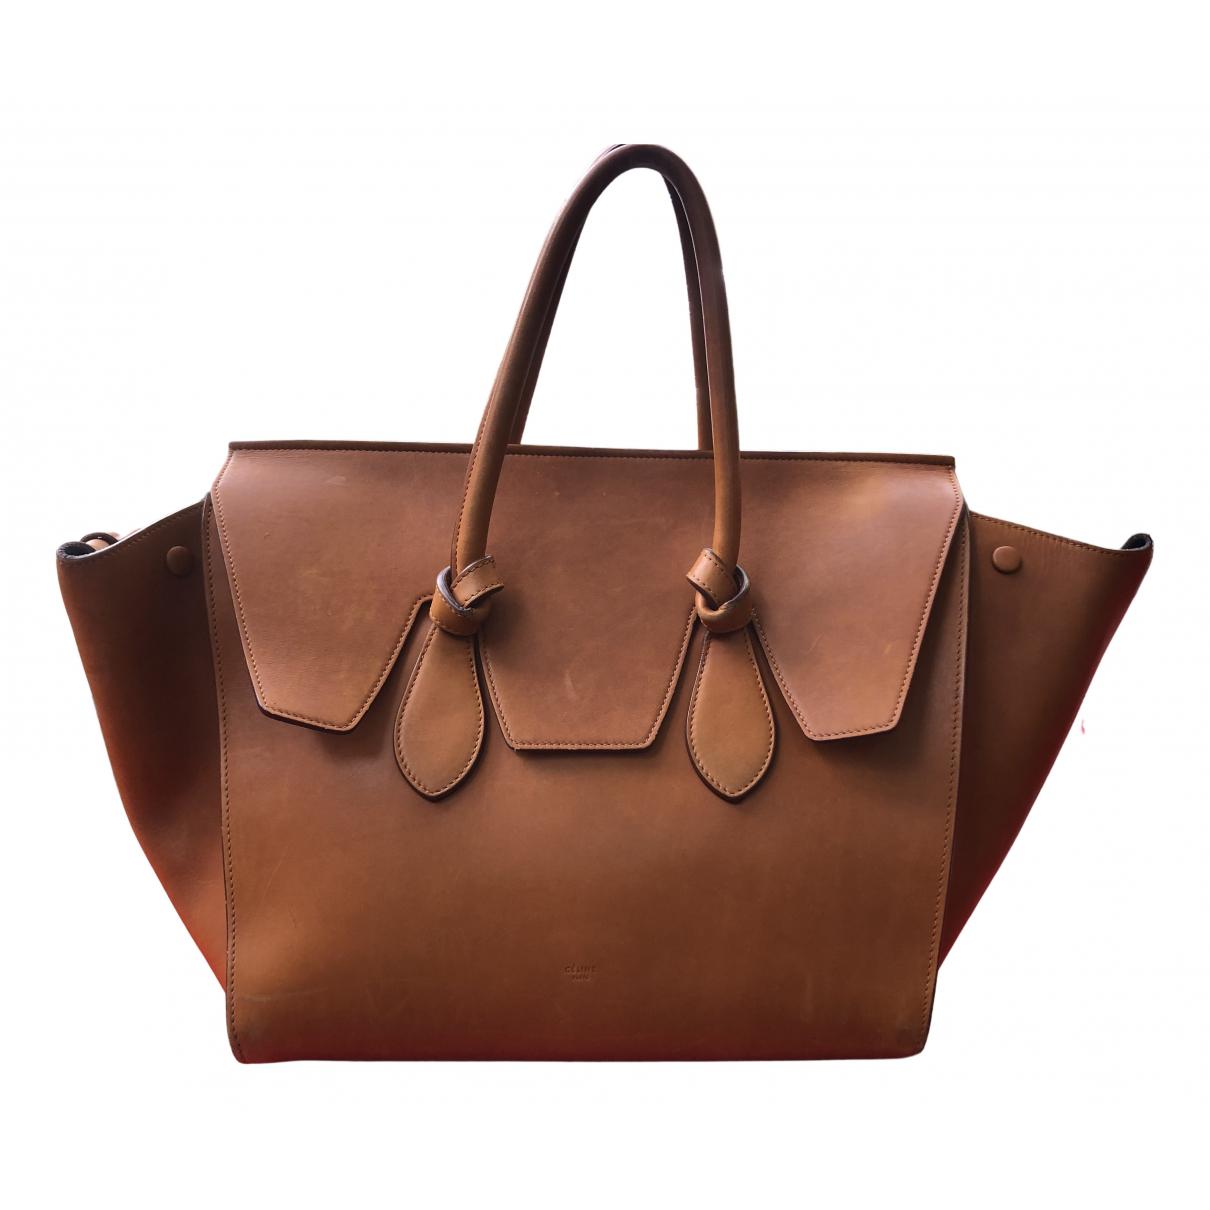 Celine Tie Camel Leather handbag for Women N